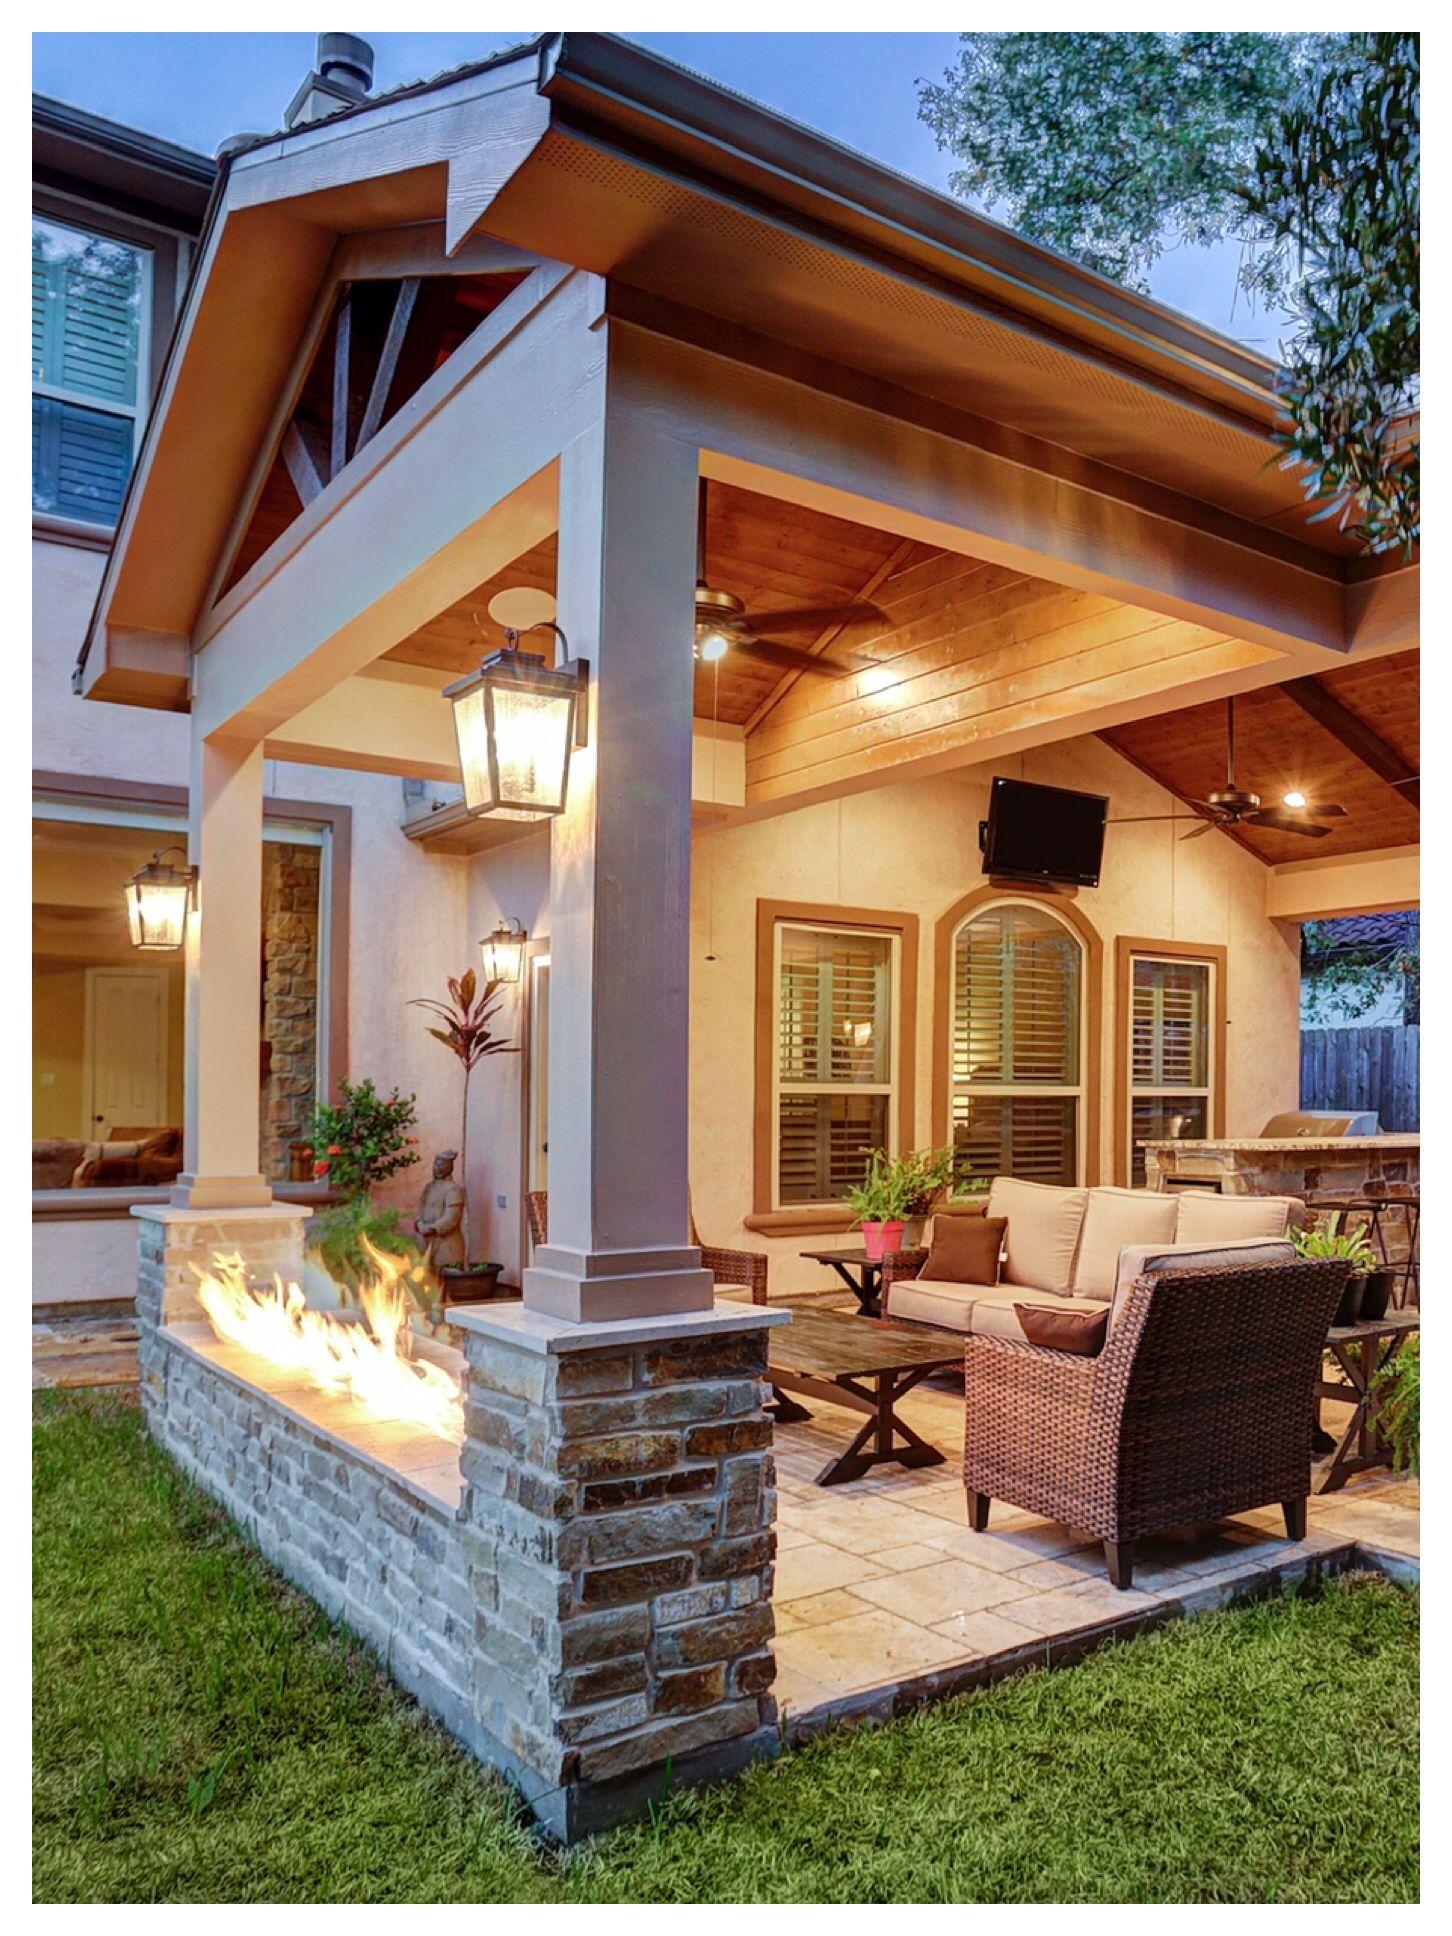 Firepit In Between Columns Outdoorliving Patio Patiocover Texascustompatios Patio Design Pergola Patio